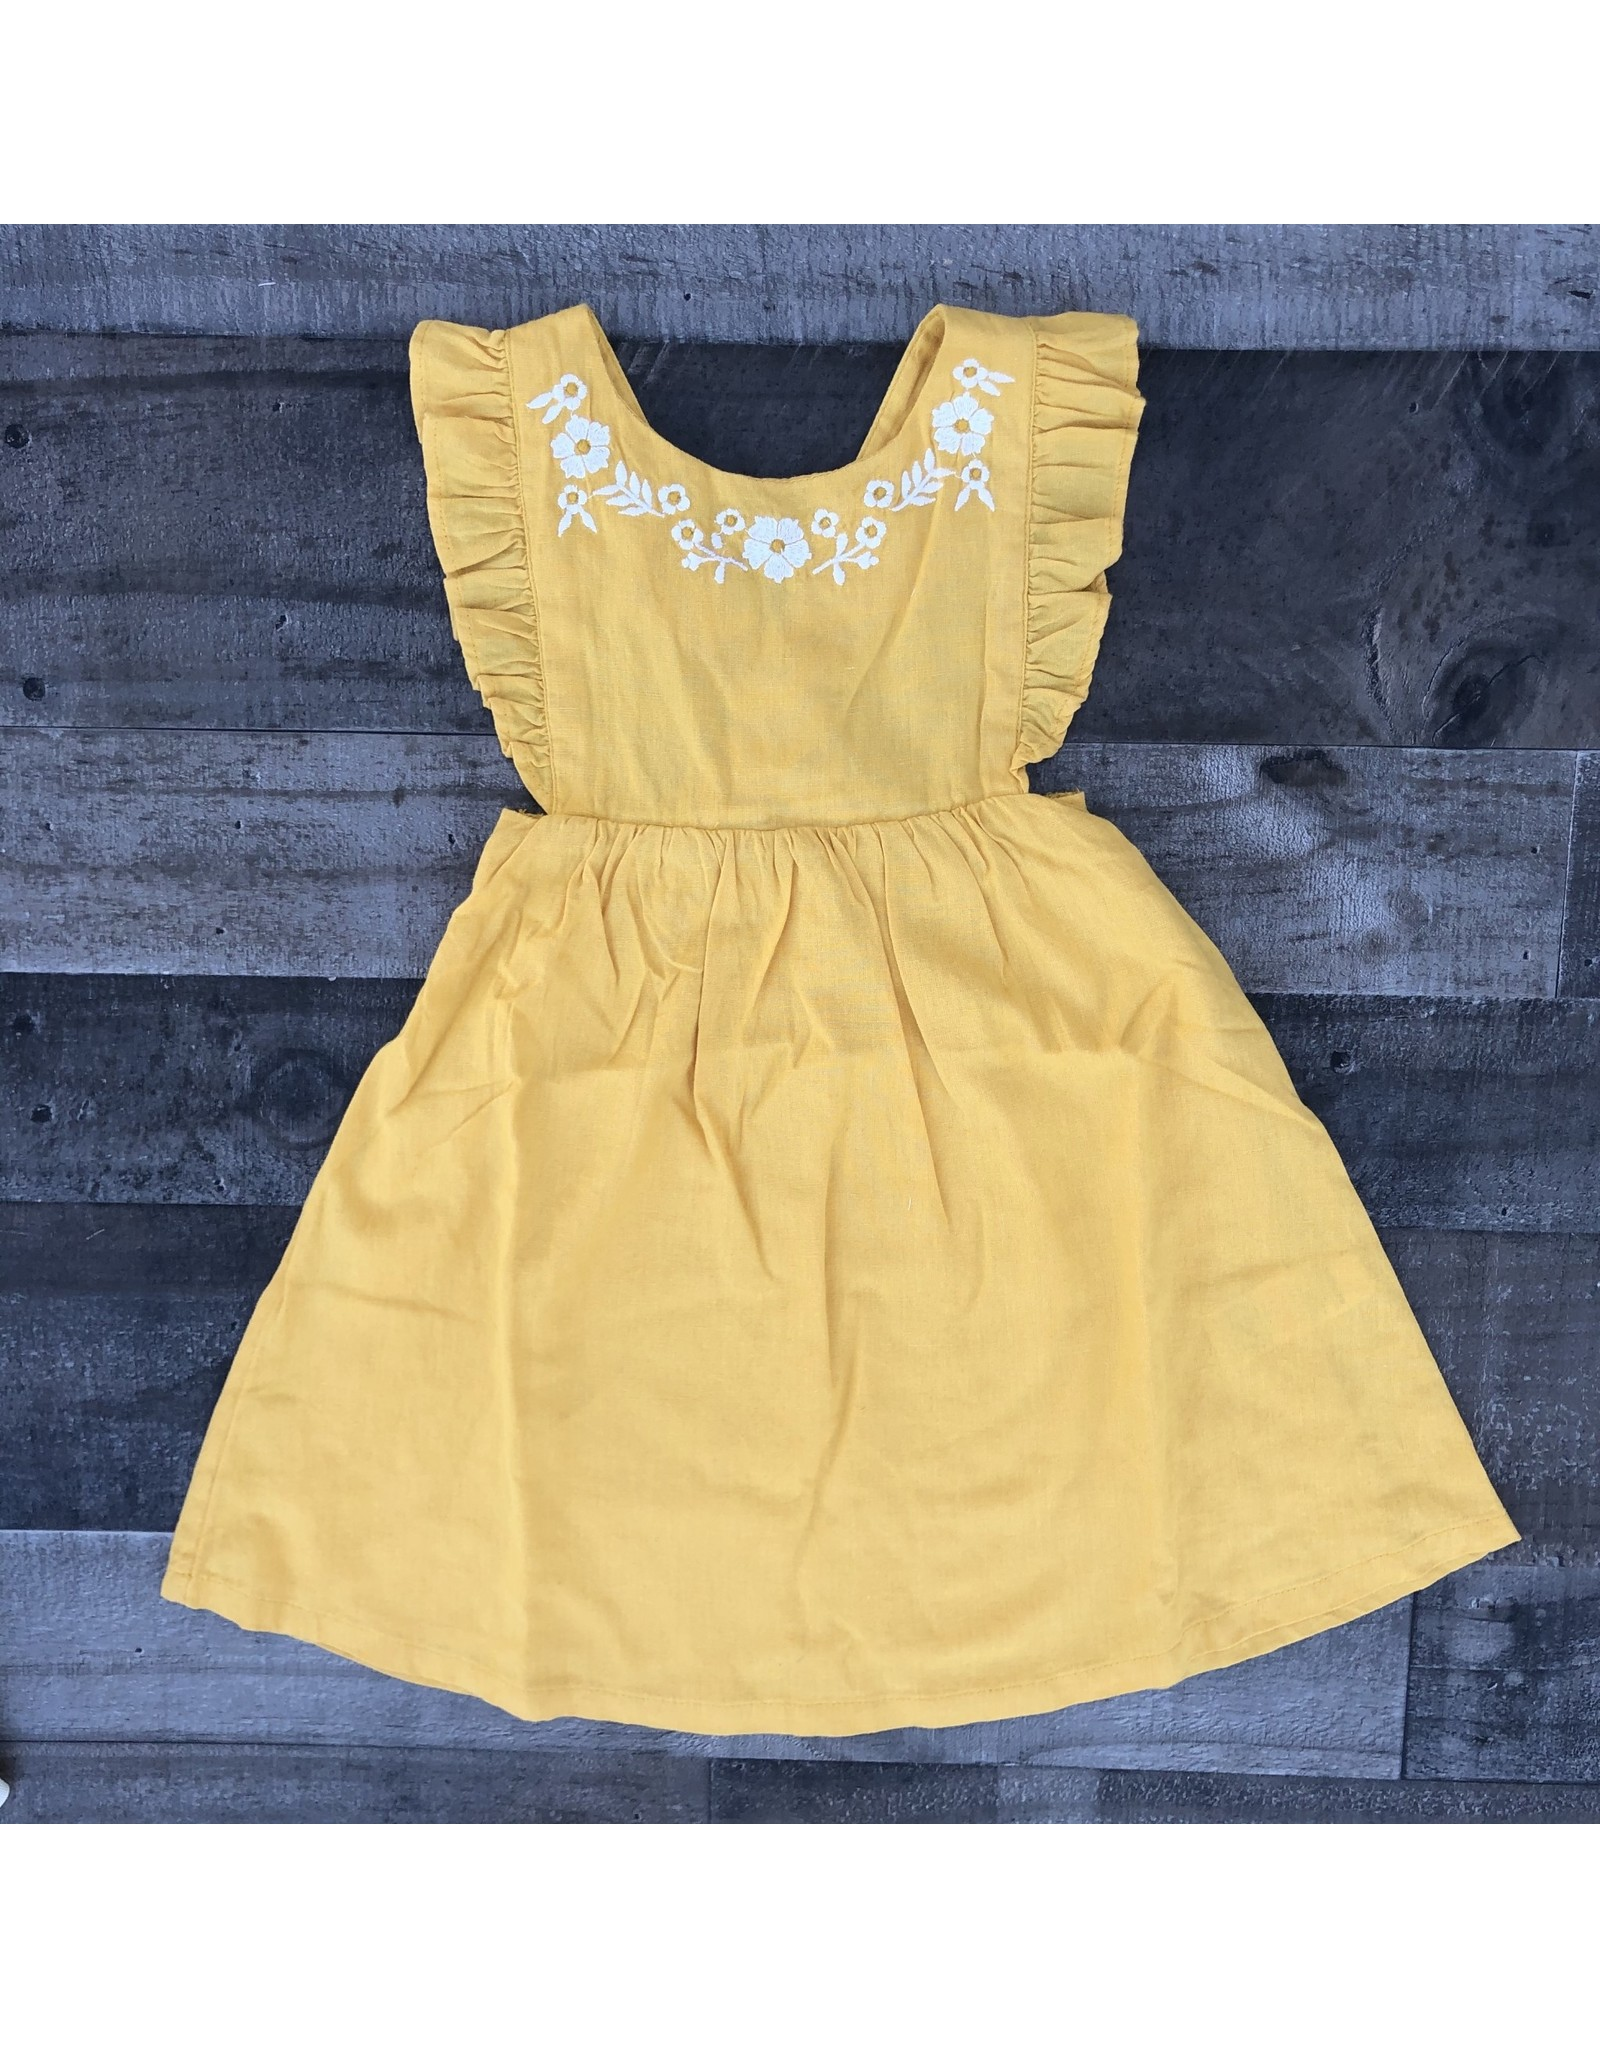 JoJo Maman Bebe' JoJo- Pretty Embroidered Summer Dress- Yellow